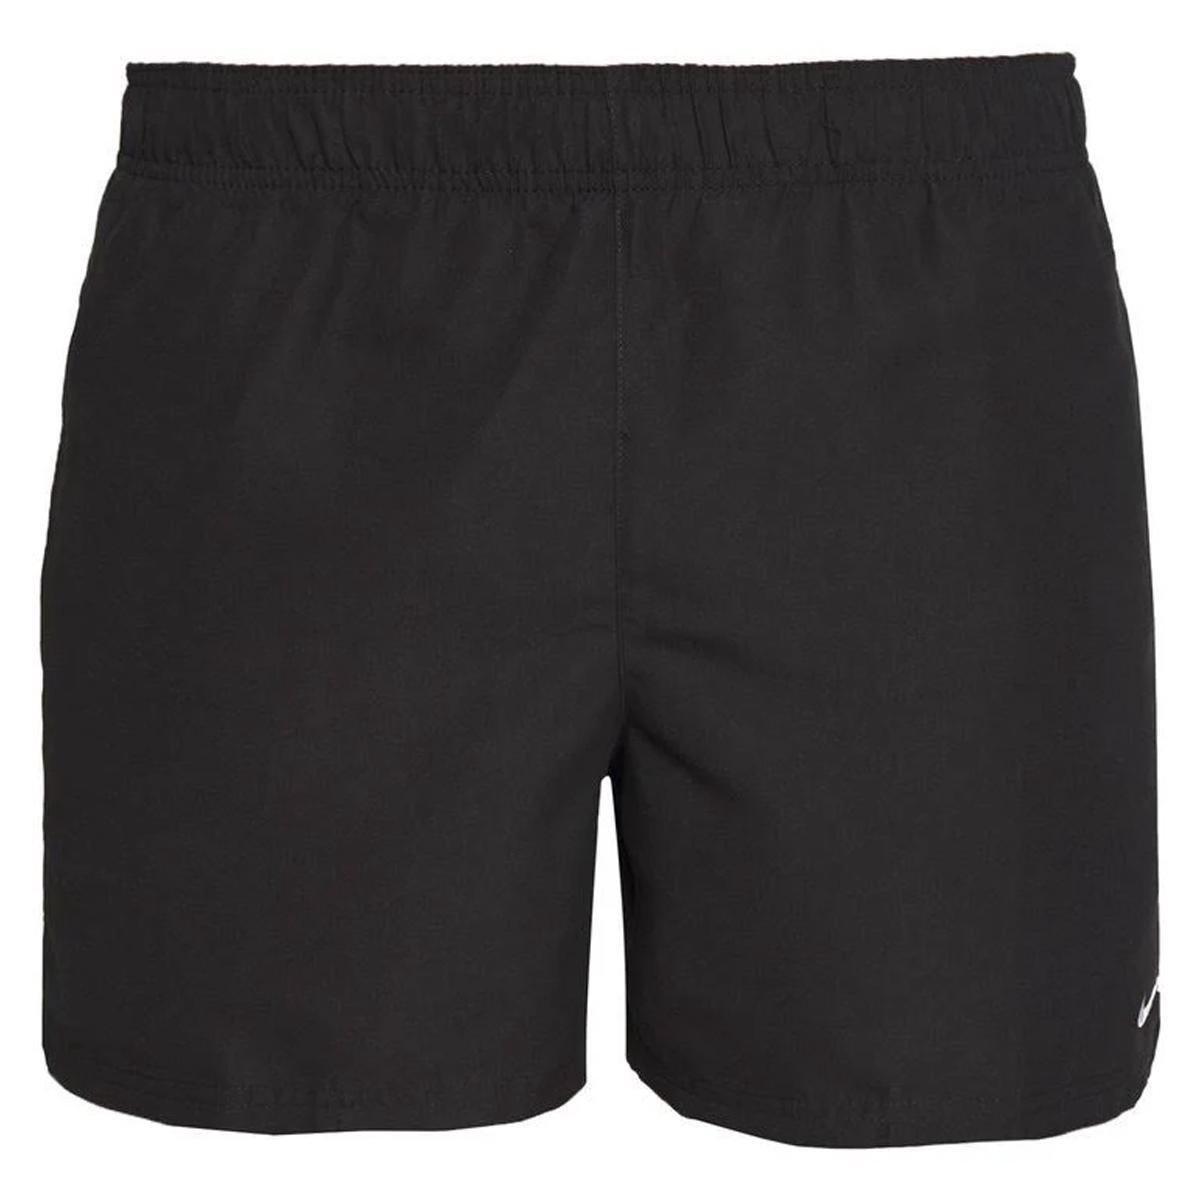 Nike Swim 5 VOLLEY SHORT Zwembroek - Zwart - Mannen - Maat L